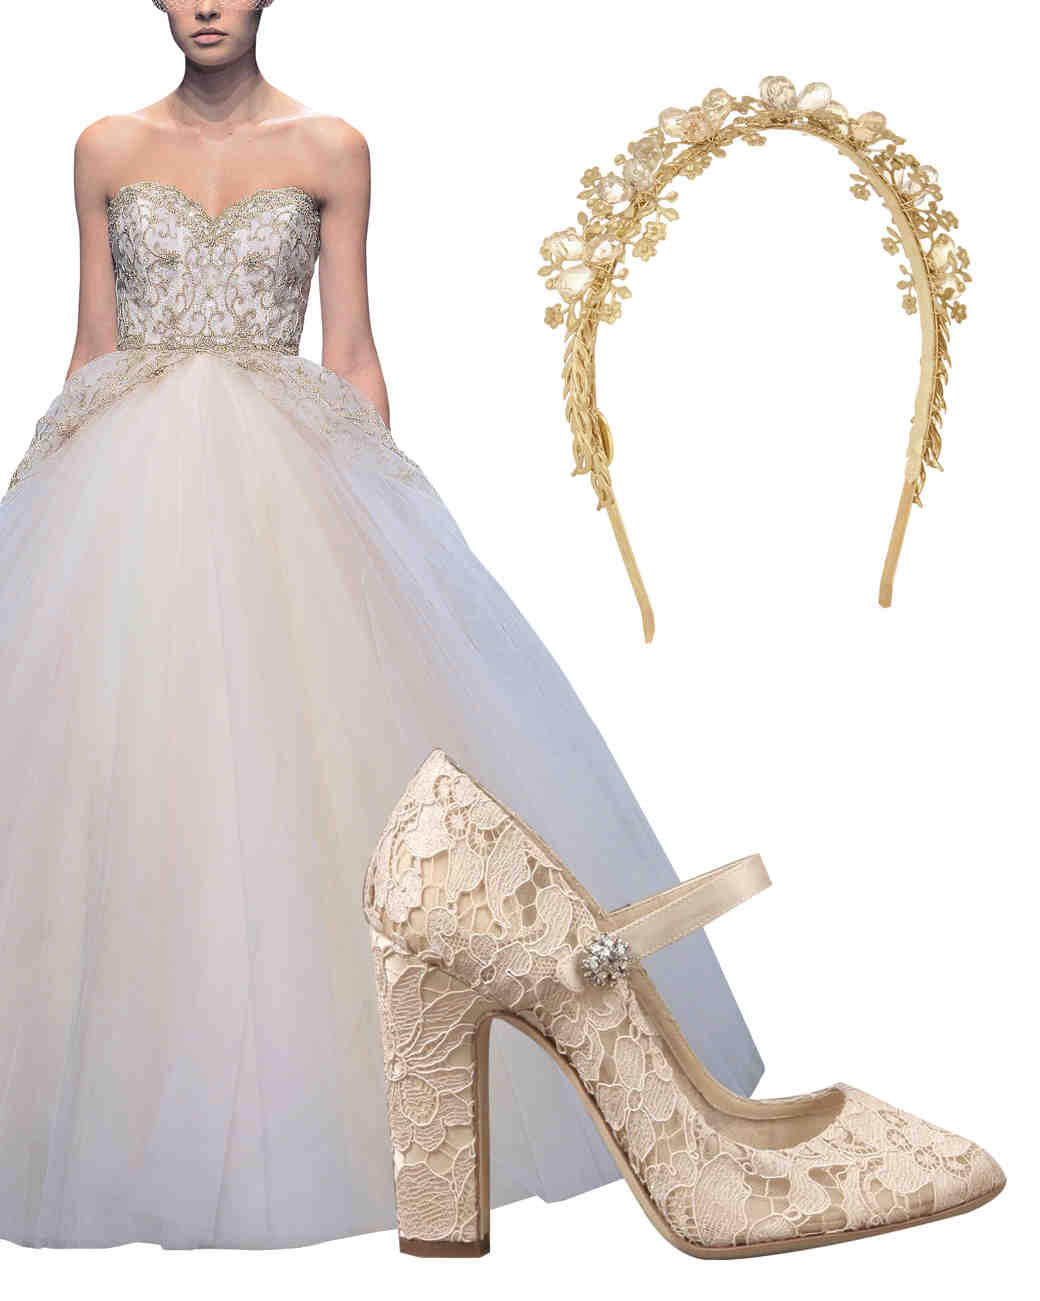 sting-trudie-styler-inspired-wedding-bride-outfit-0814.jpg